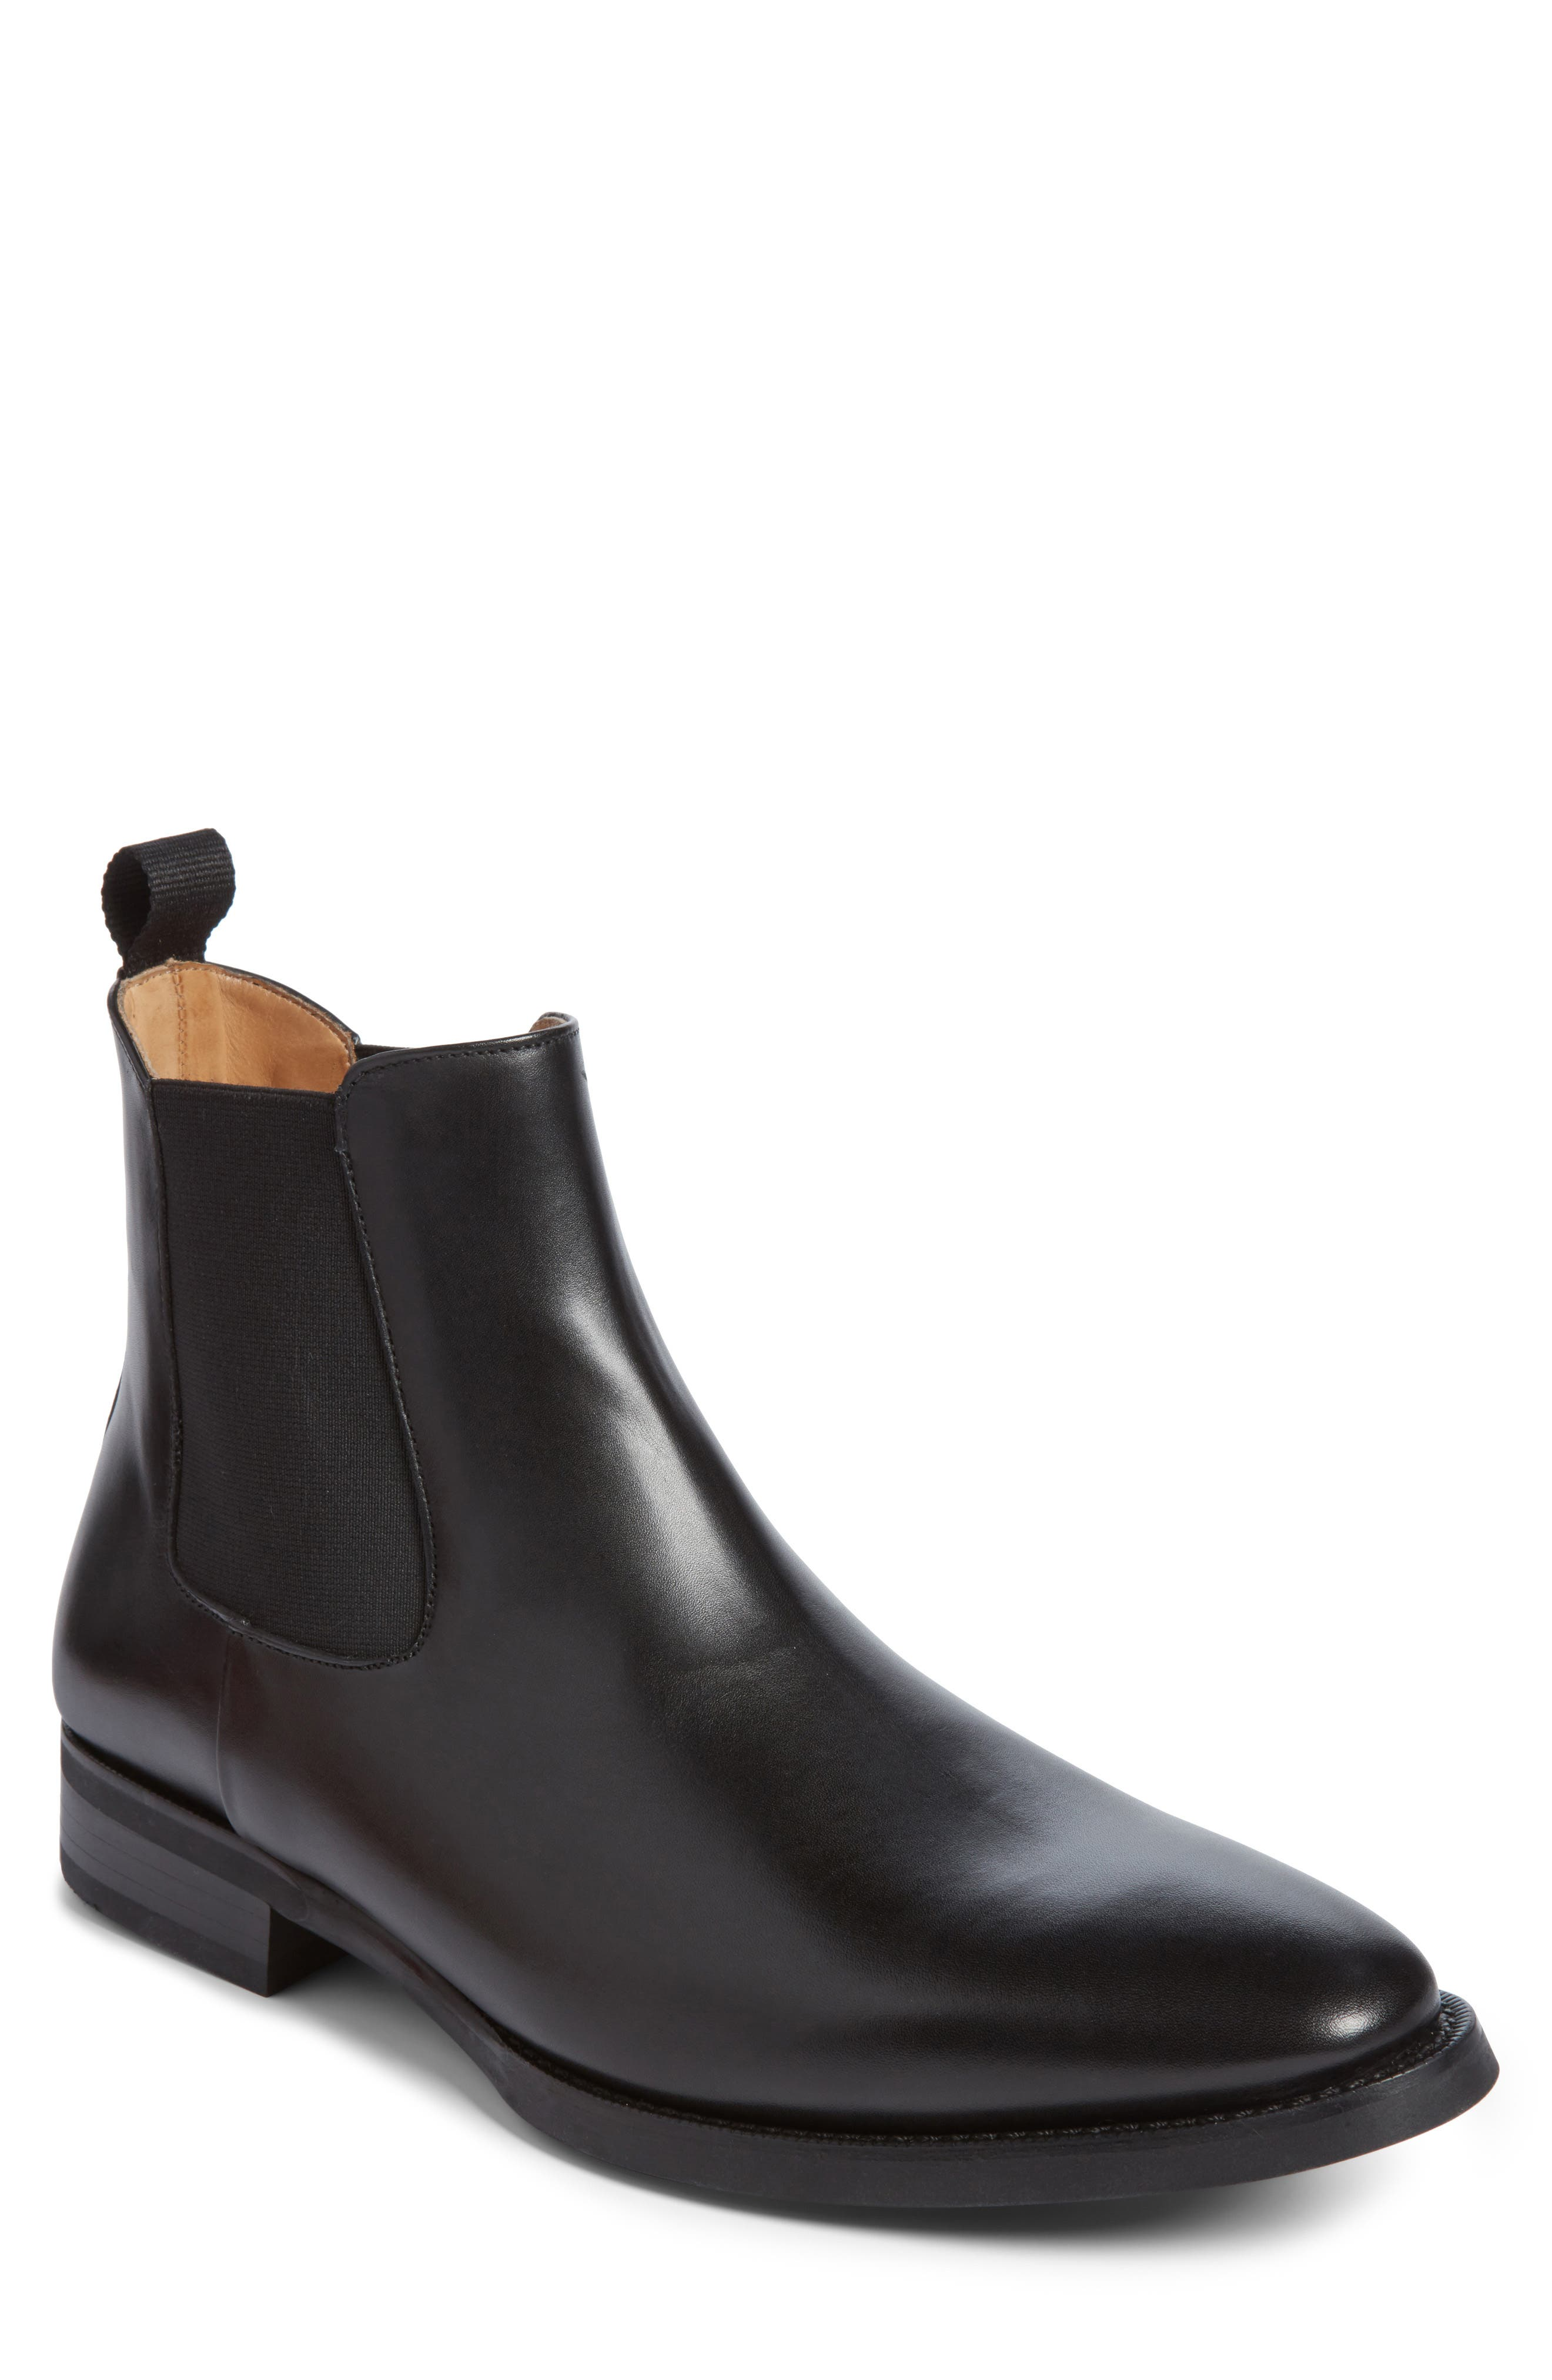 Alternate Image 1 Selected - Jack Erwin Ellis Water Resistant Chelsea Boot (Men)